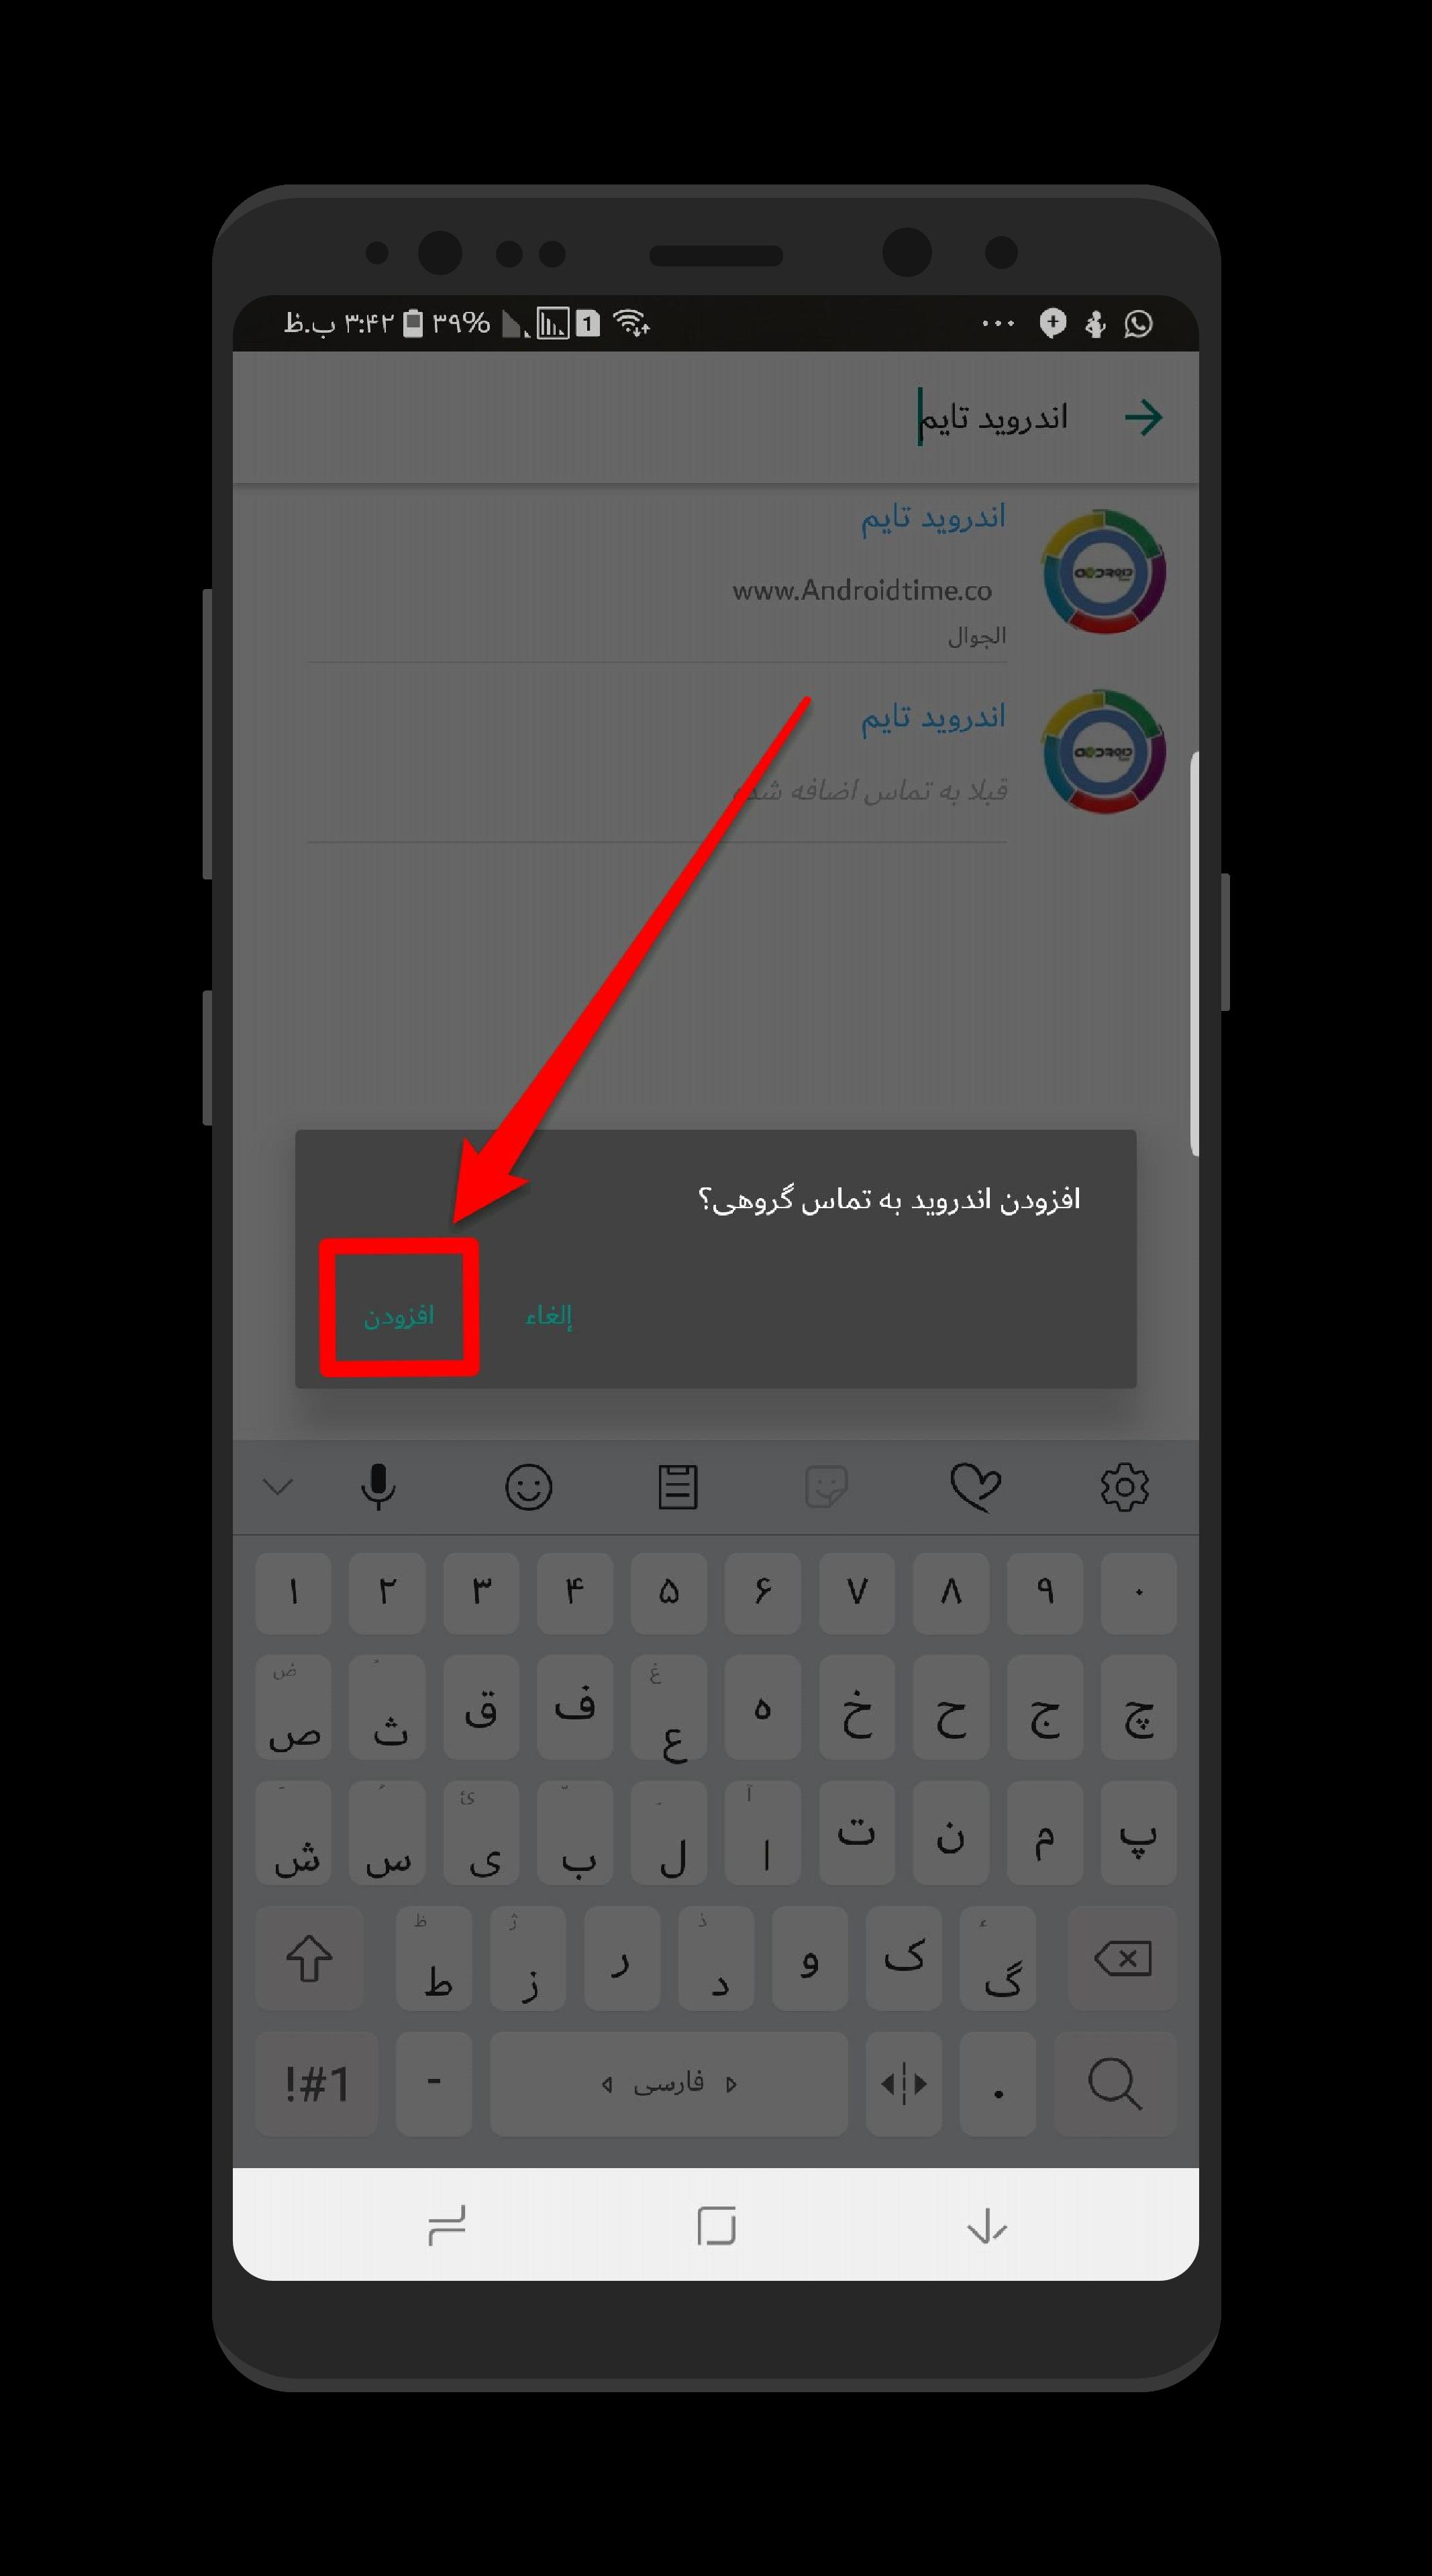 چگونه با واتس اپ تماس تصویری و تماس صوتی گروهی بگیریم؟